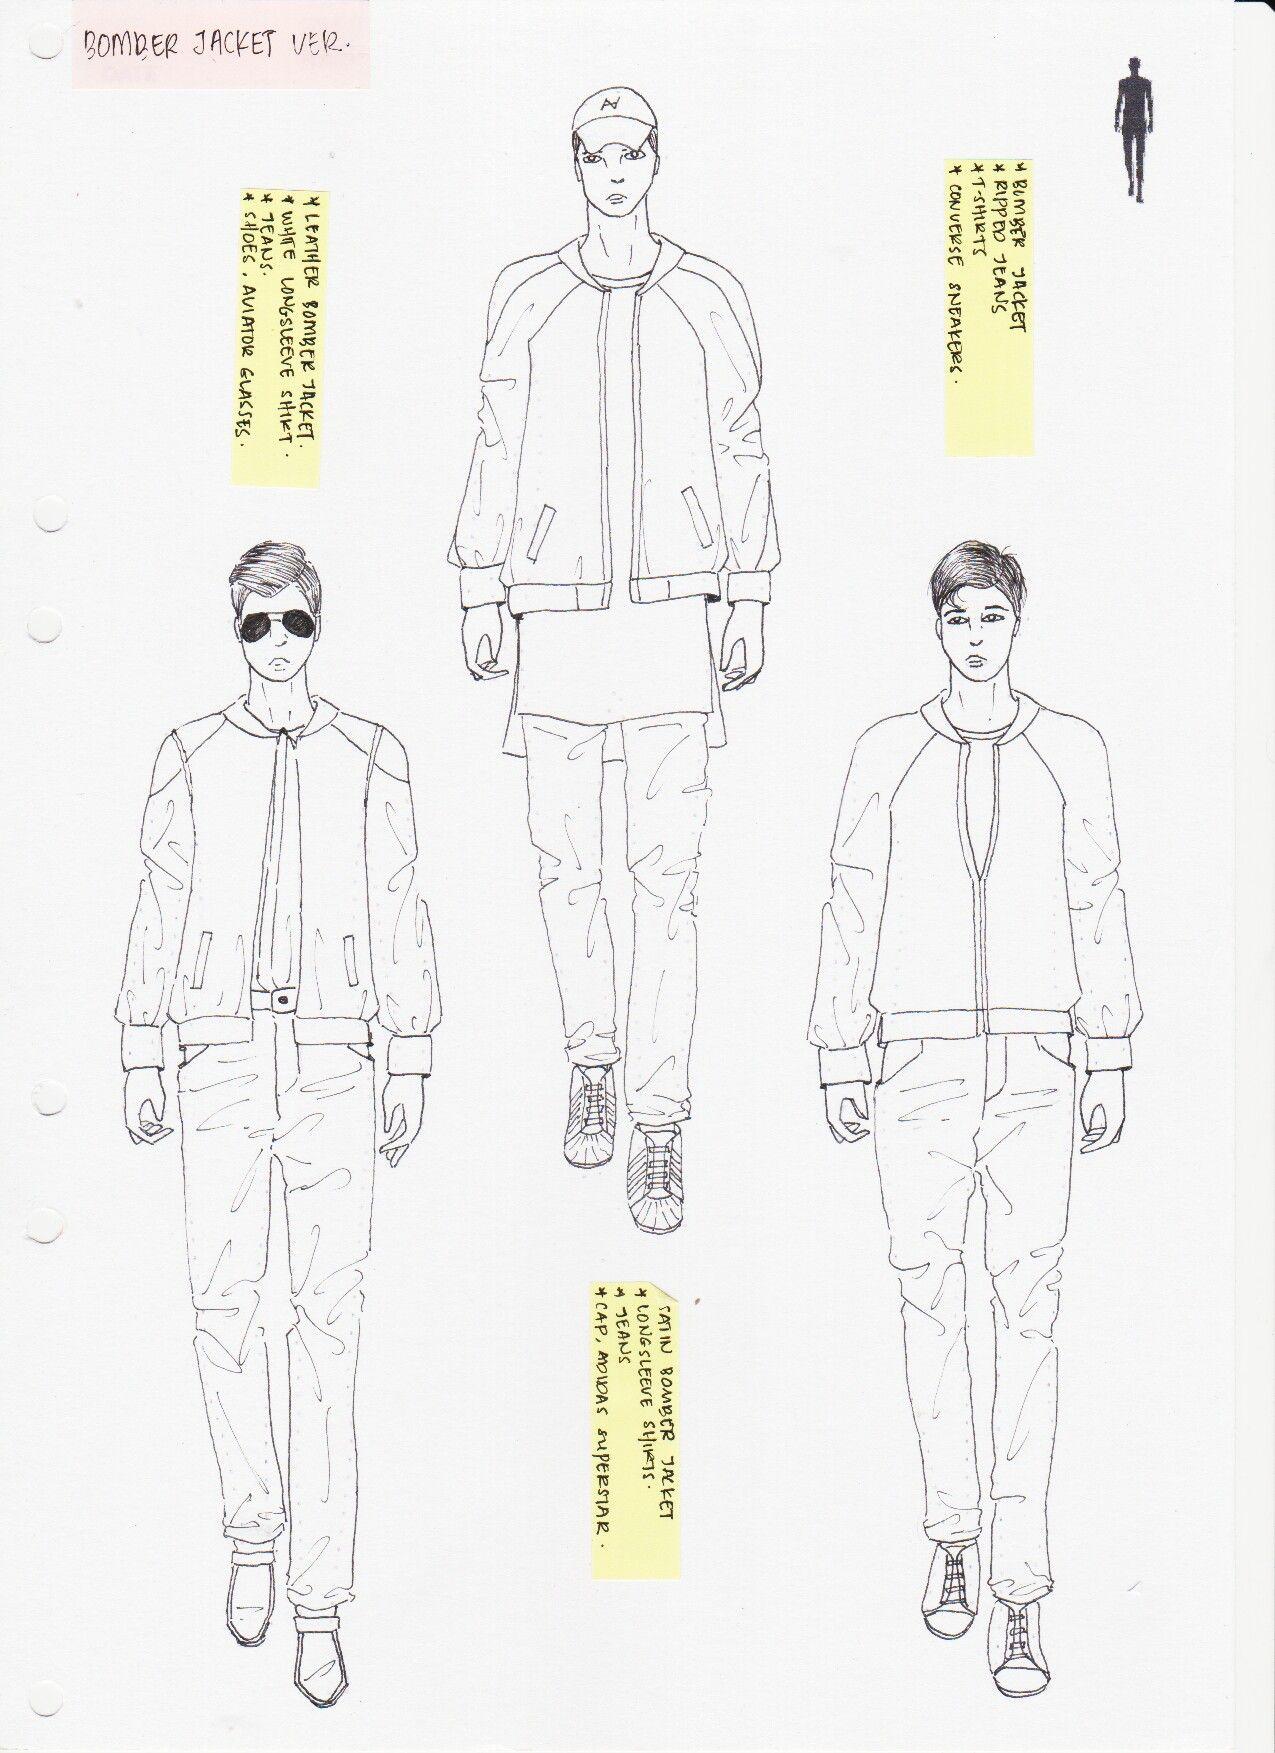 Bomber jacket for men style ideas.